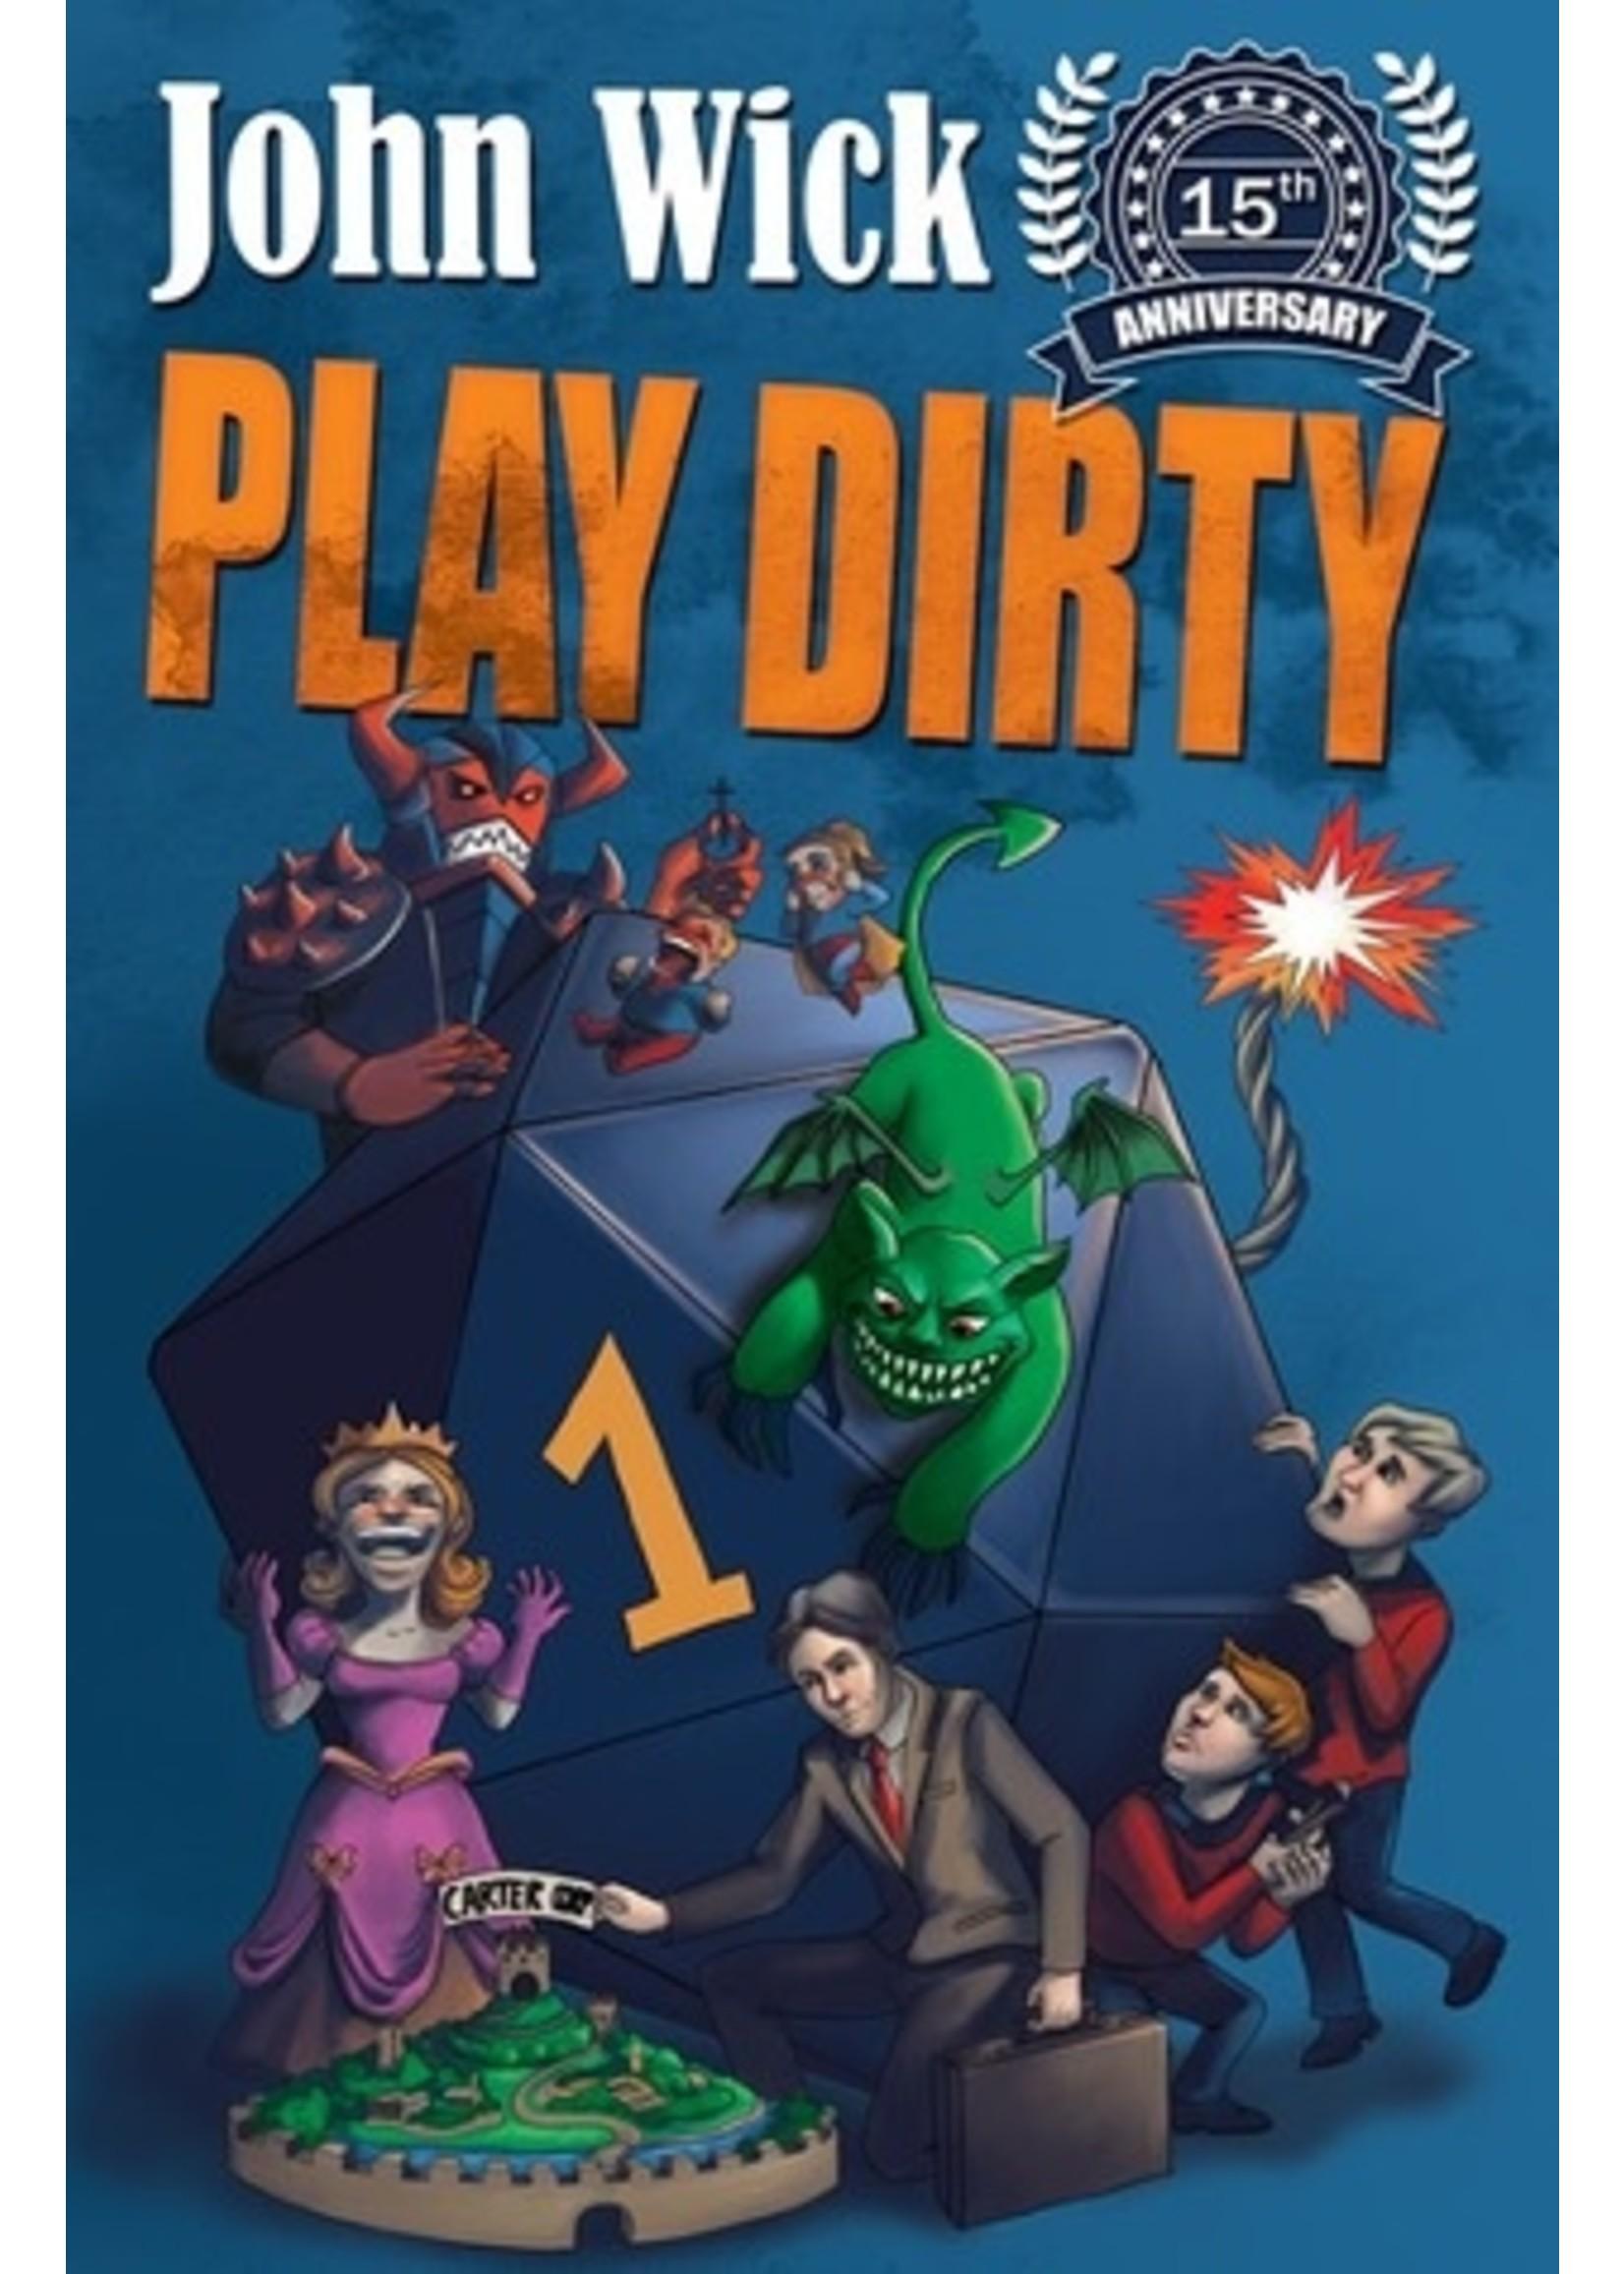 Play Dirty by John Wick Book